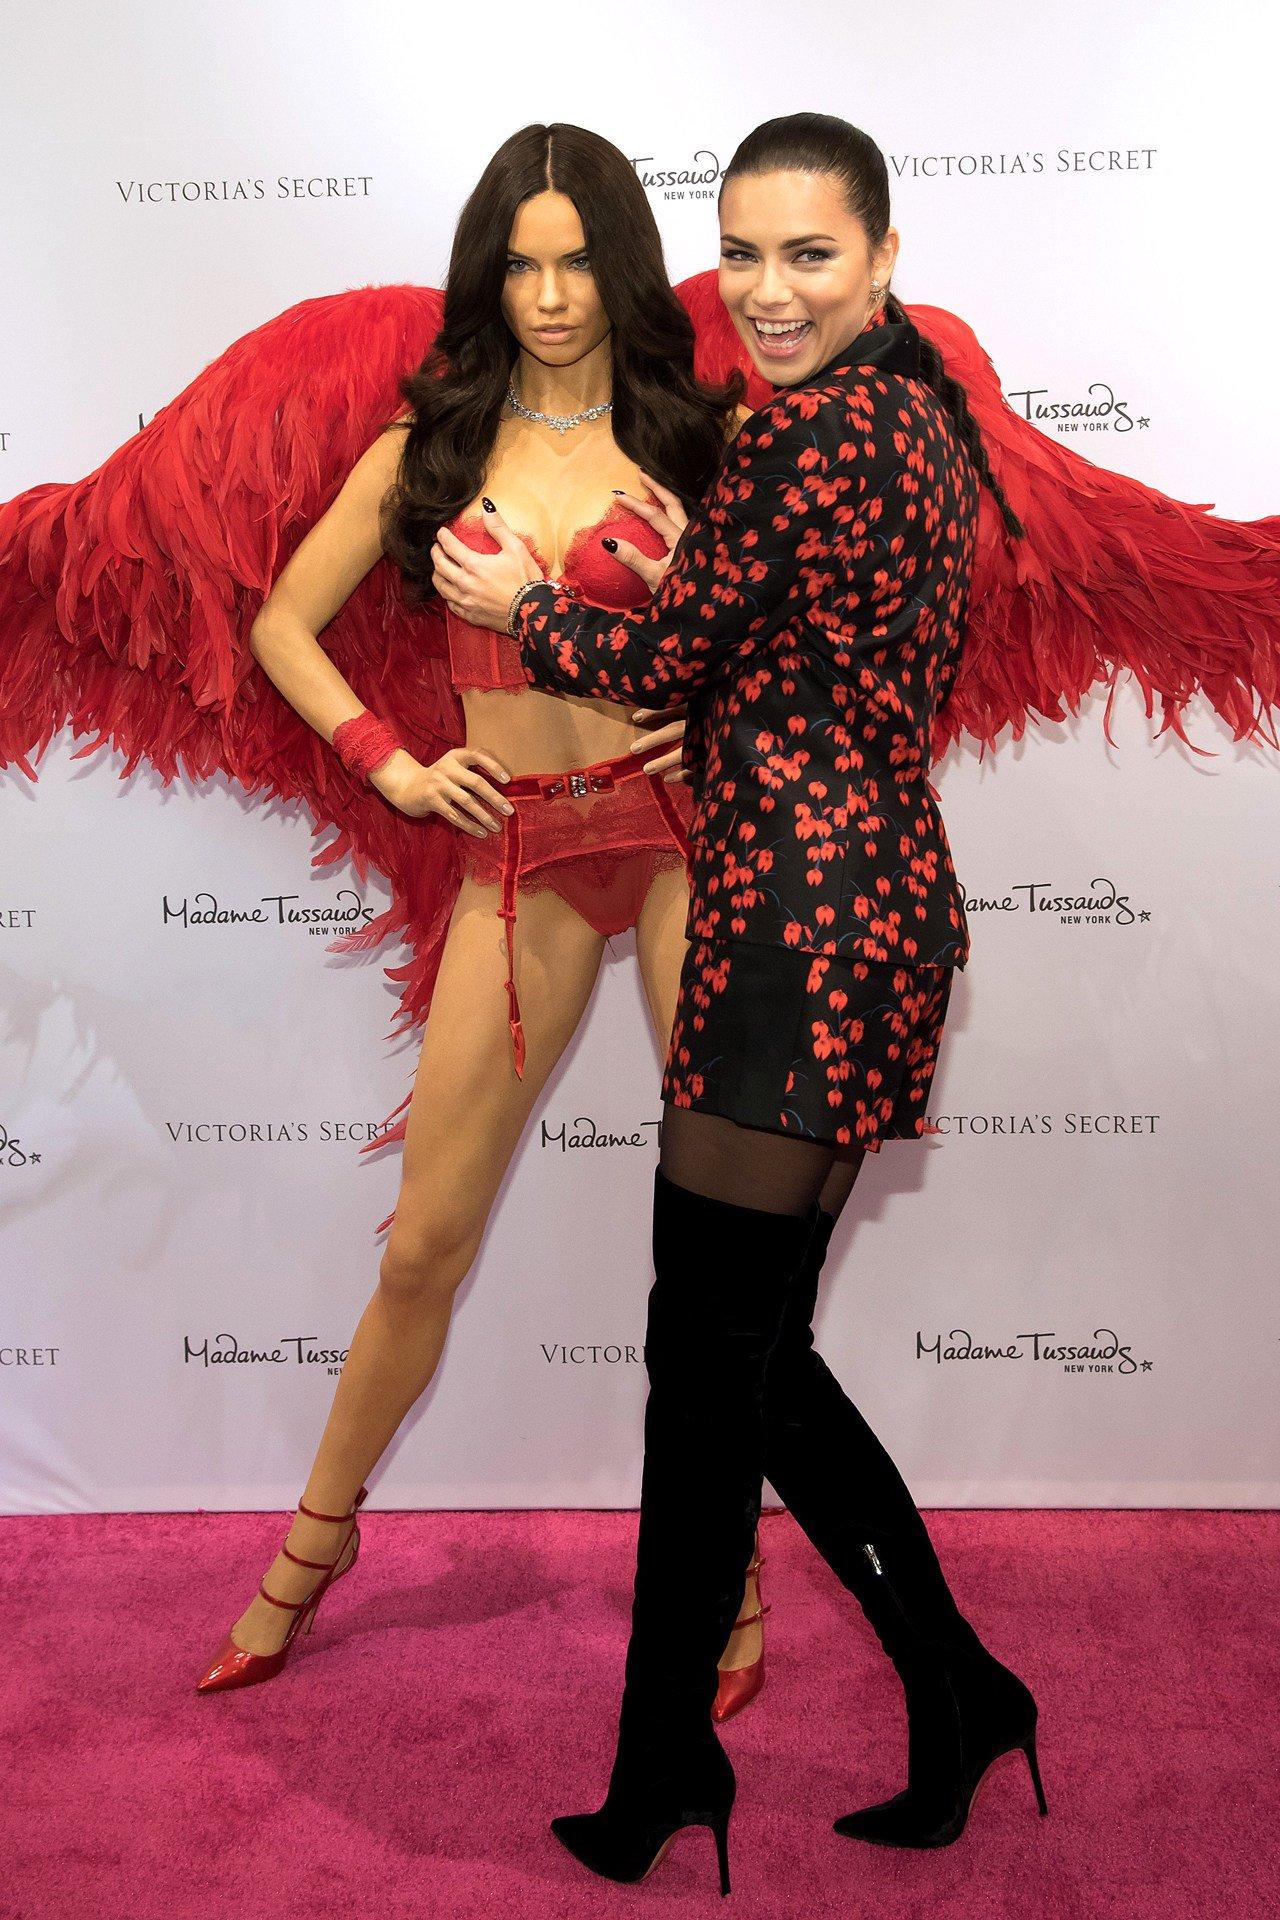 Why @AdrianaLima's waxwork is wearing red: https://t.co/82QtlCFI9q https://t.co/lFrCIRsGo9